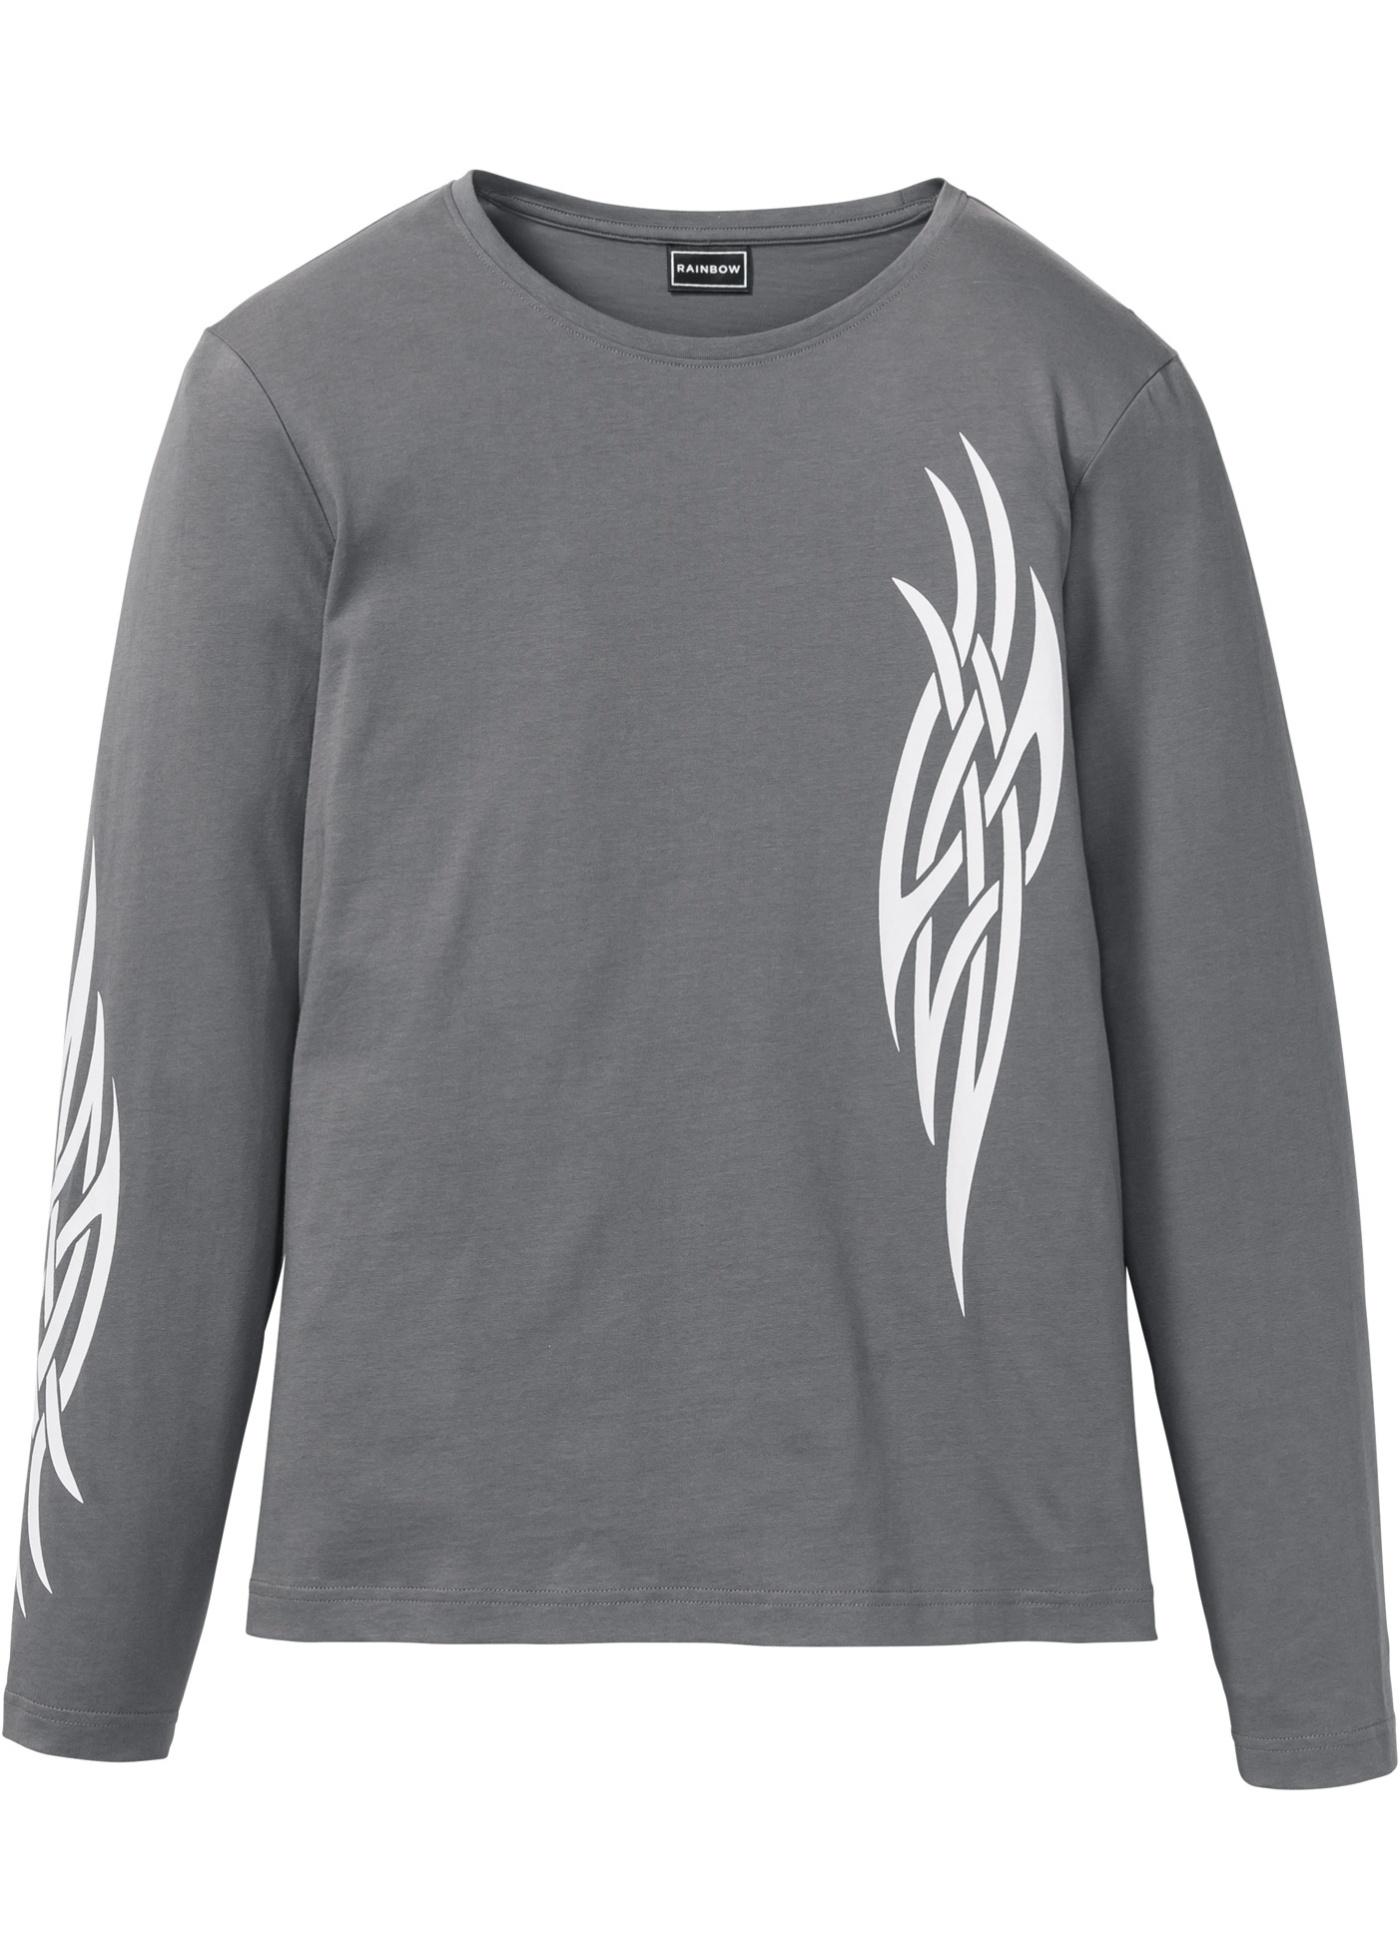 Bonprix SE - Långärmad T-shirt, smal passform 129.00